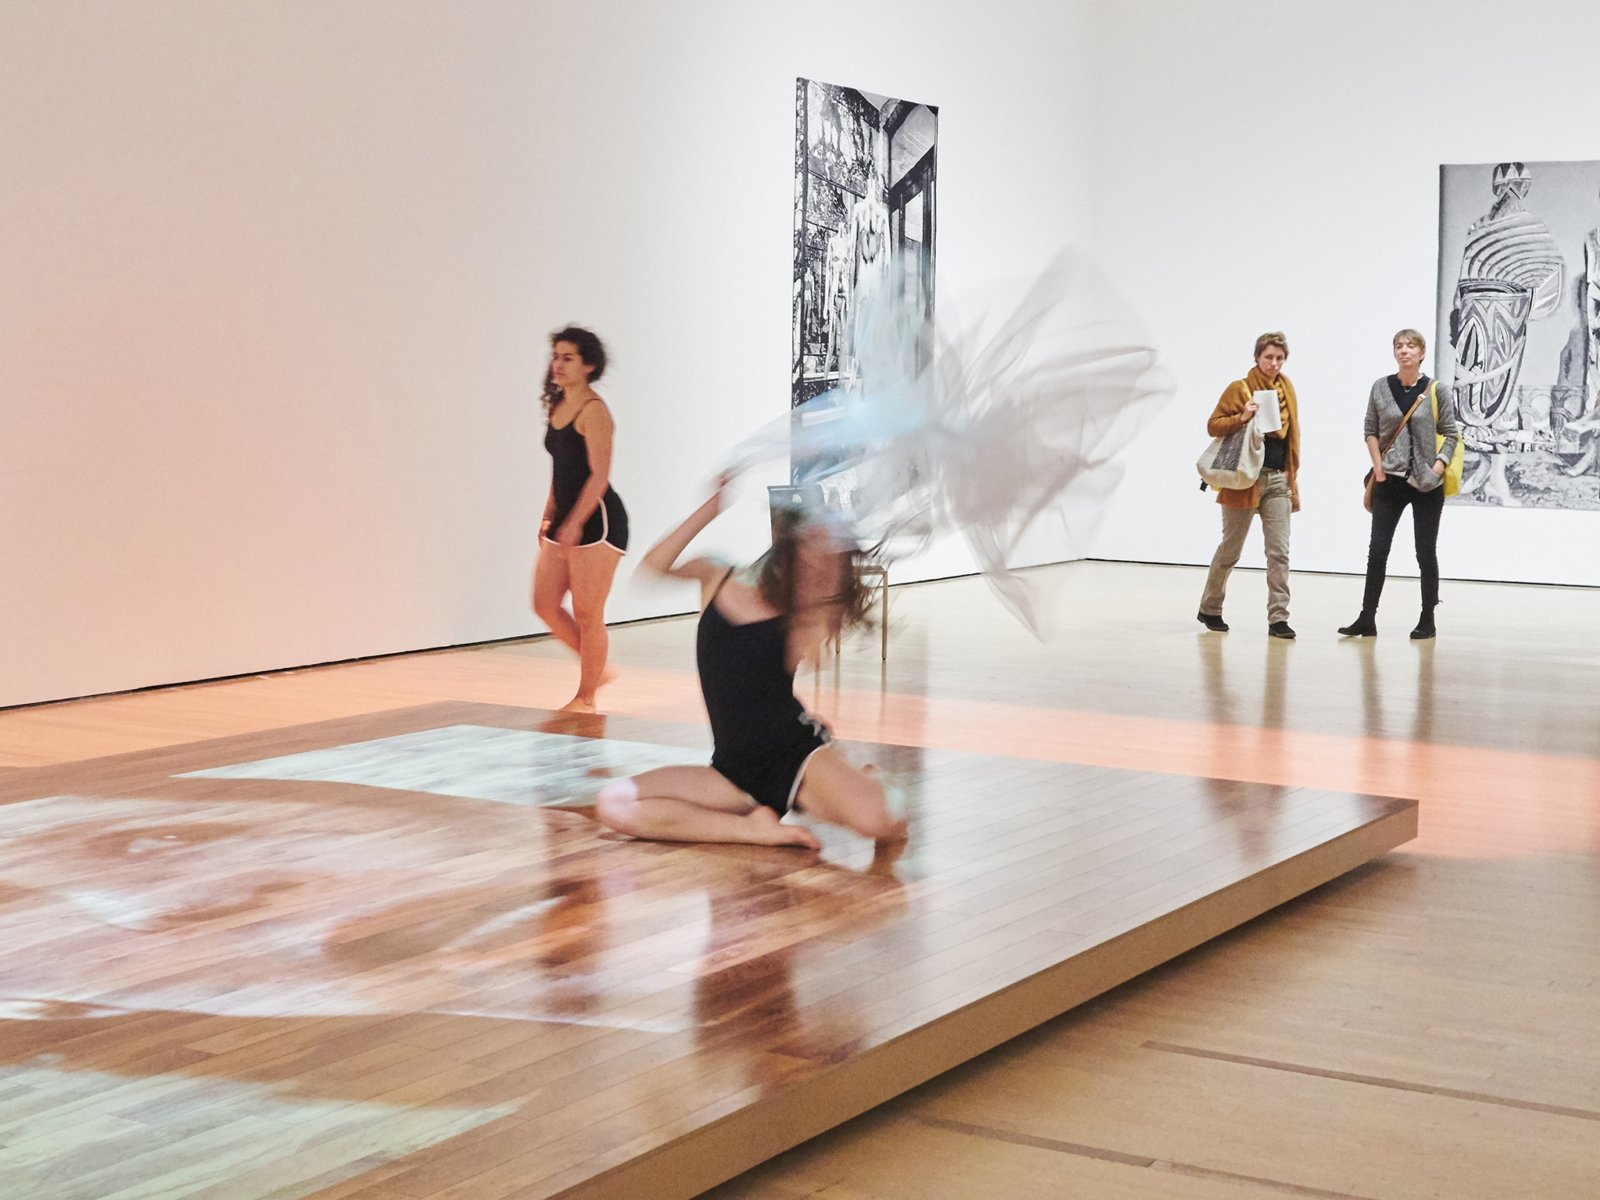 Tanya Lukin Linklater, He was a poet and he taught us how to react and to become this poetry, Part 2, 2016, site-specific performance. Performance documentation, Le Grand Balcon, La Biennale de Montréal, Museé d'art contemporain de Montréal, Canada, 2016